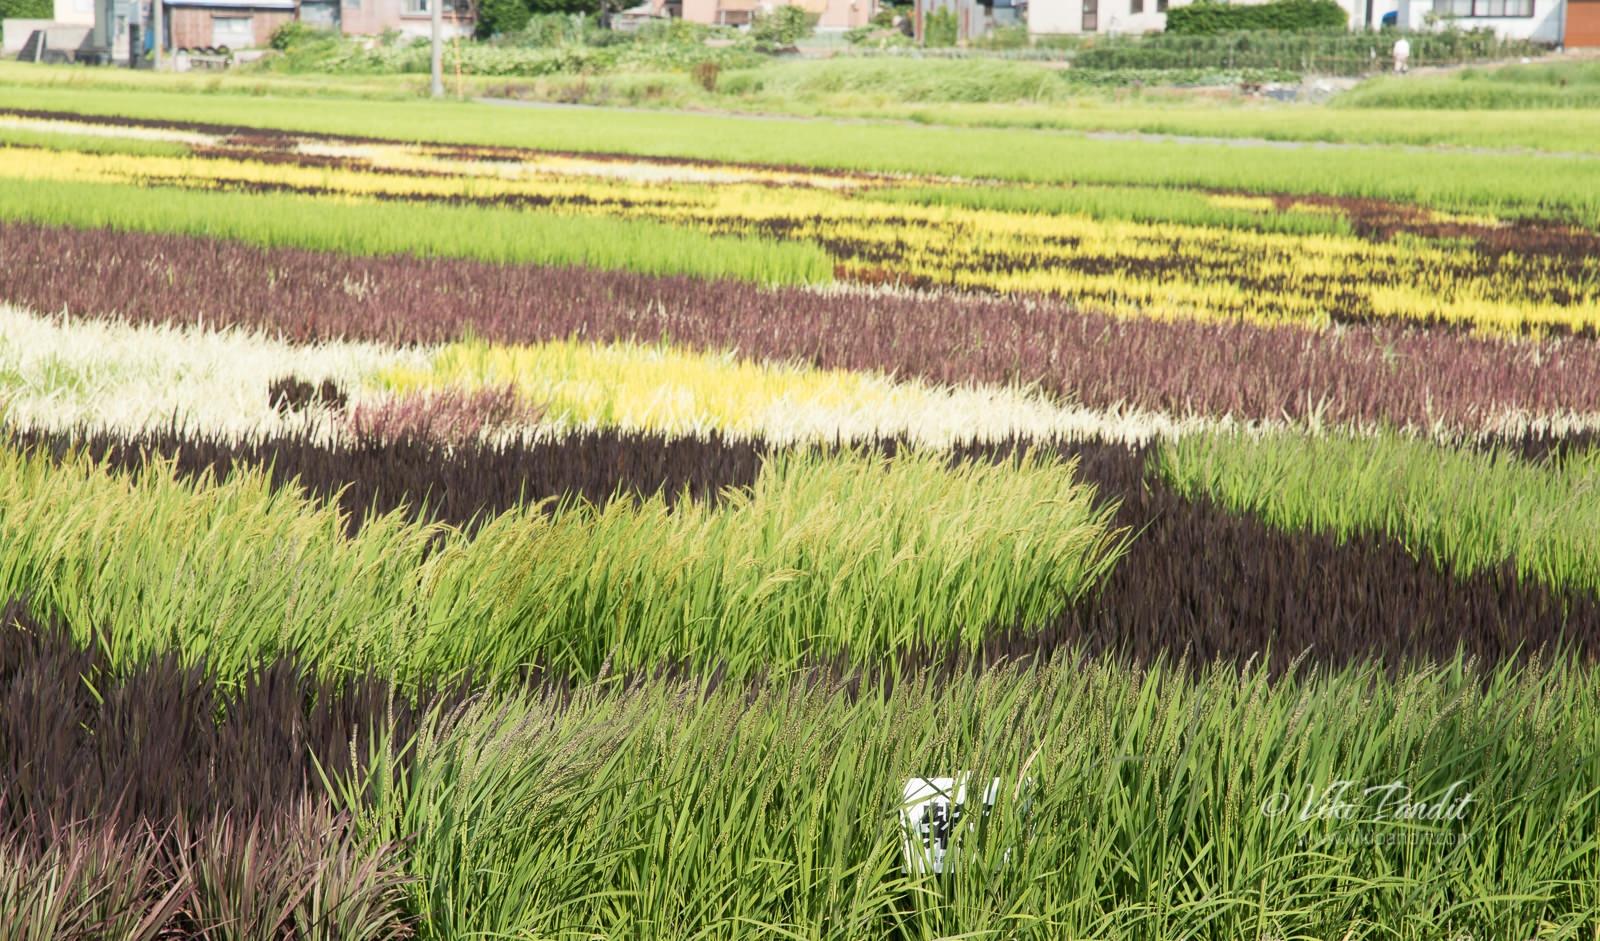 Inakadate-Colored-Rice-FIelds